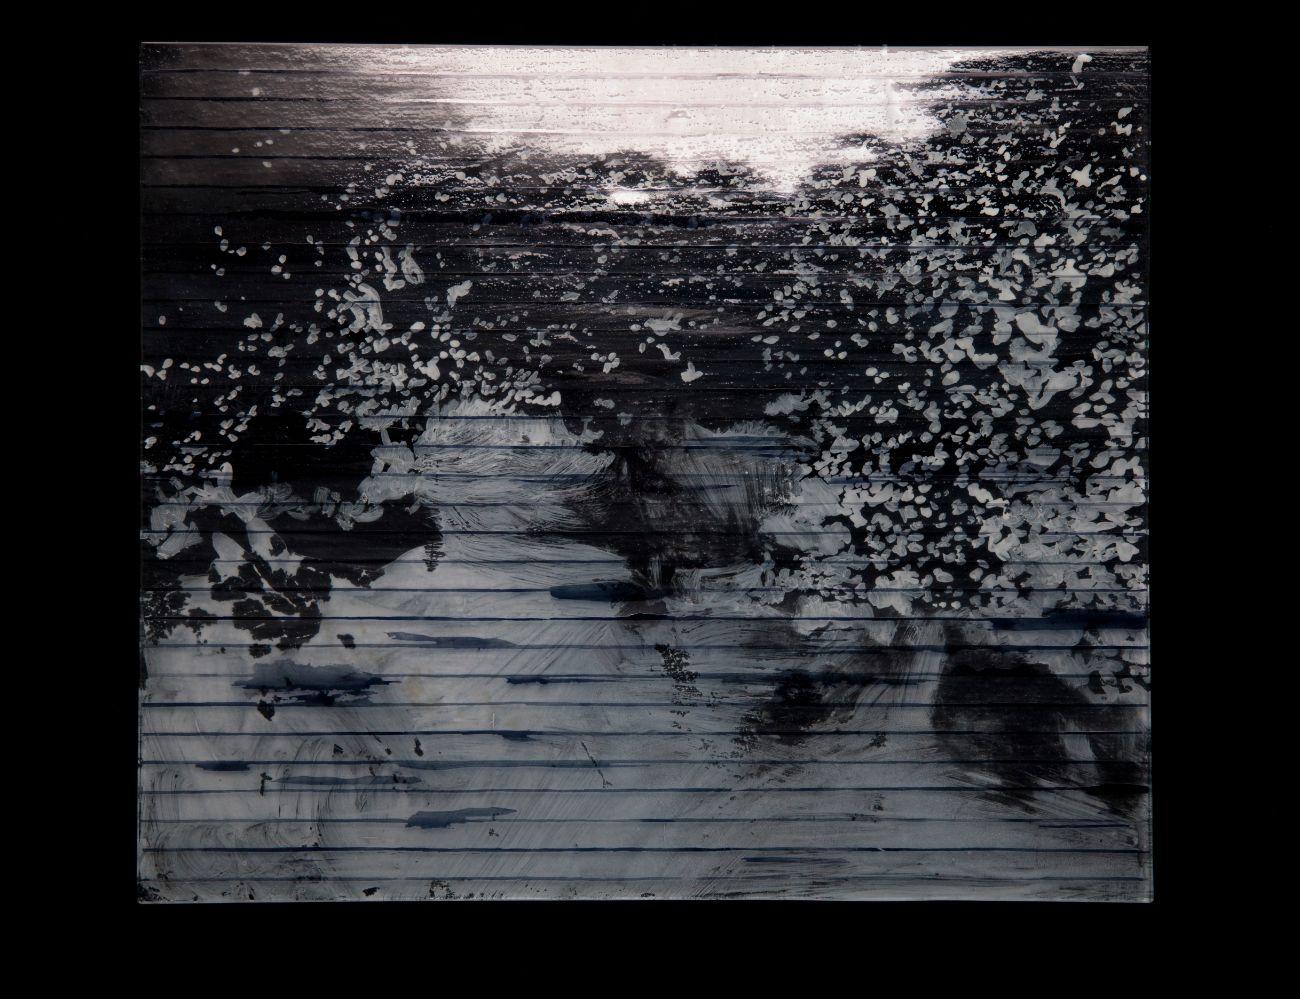 9. zo série Oceano, 35x30cm, maľba na skle, 2017